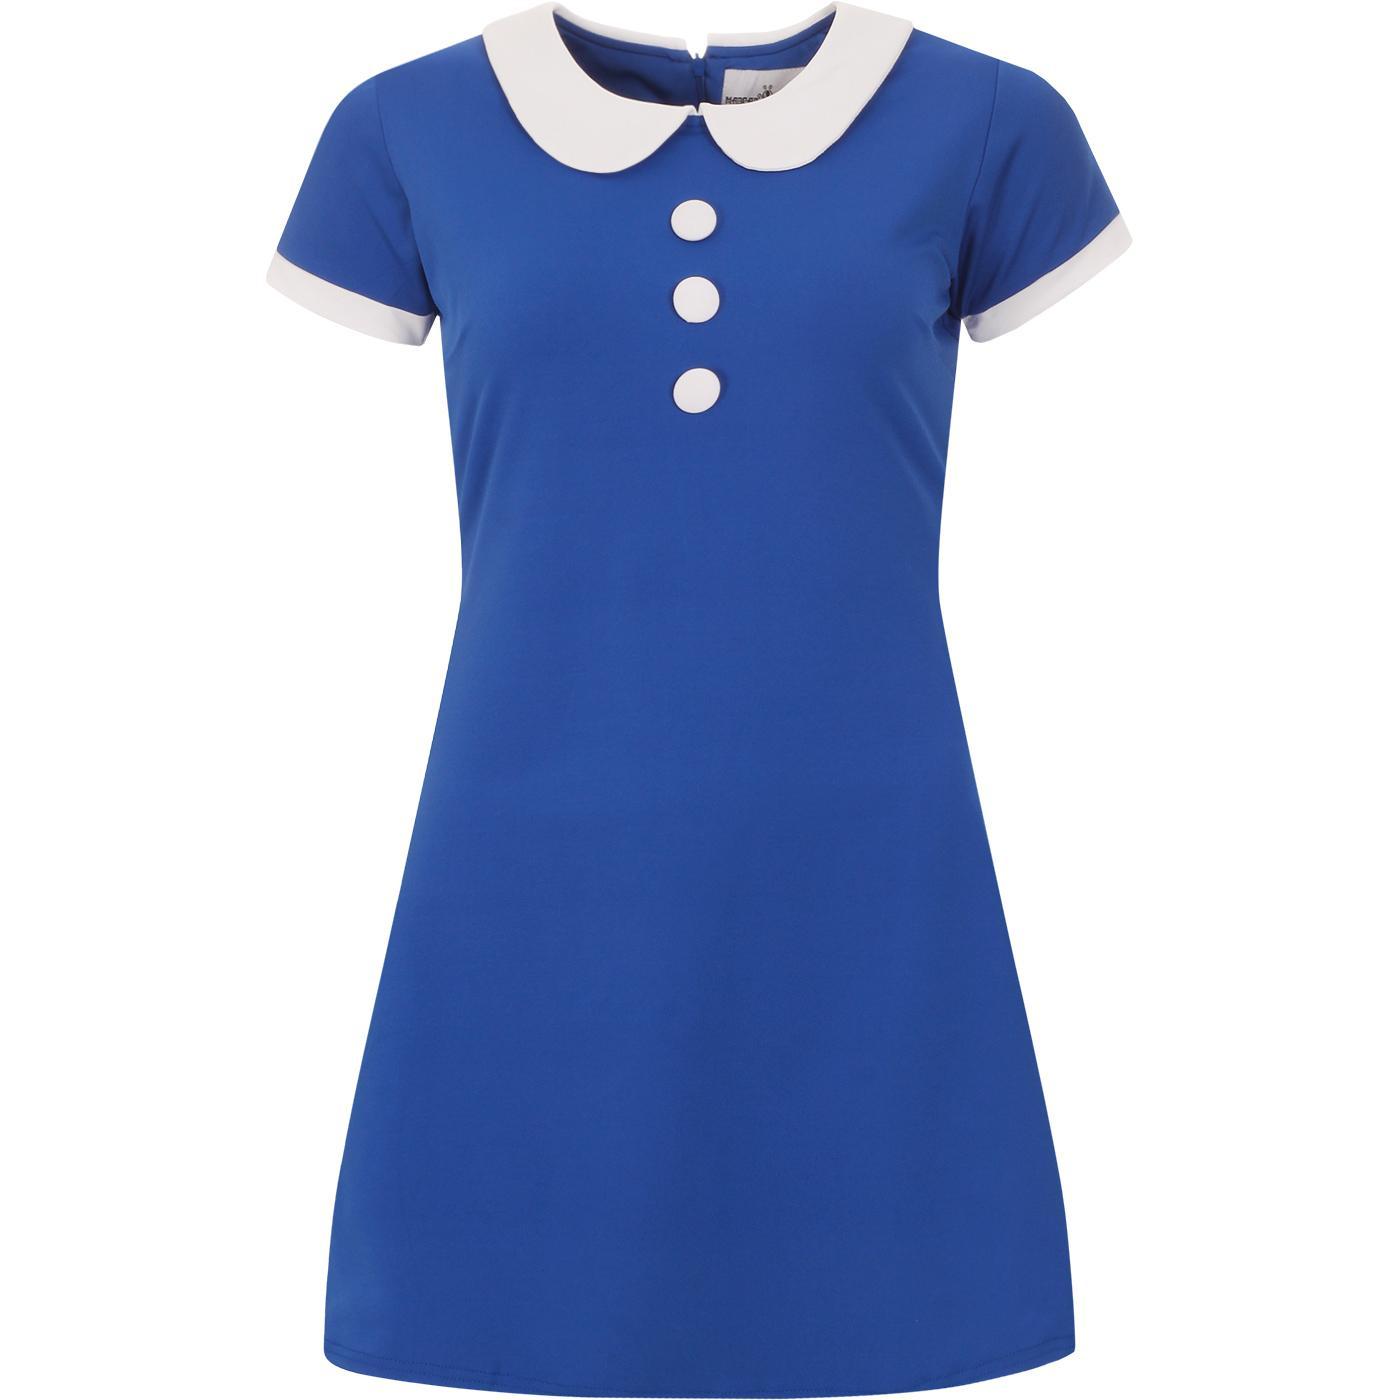 Dollierocker MADCAP ENGLAND 60s Mod Dress (Blue)